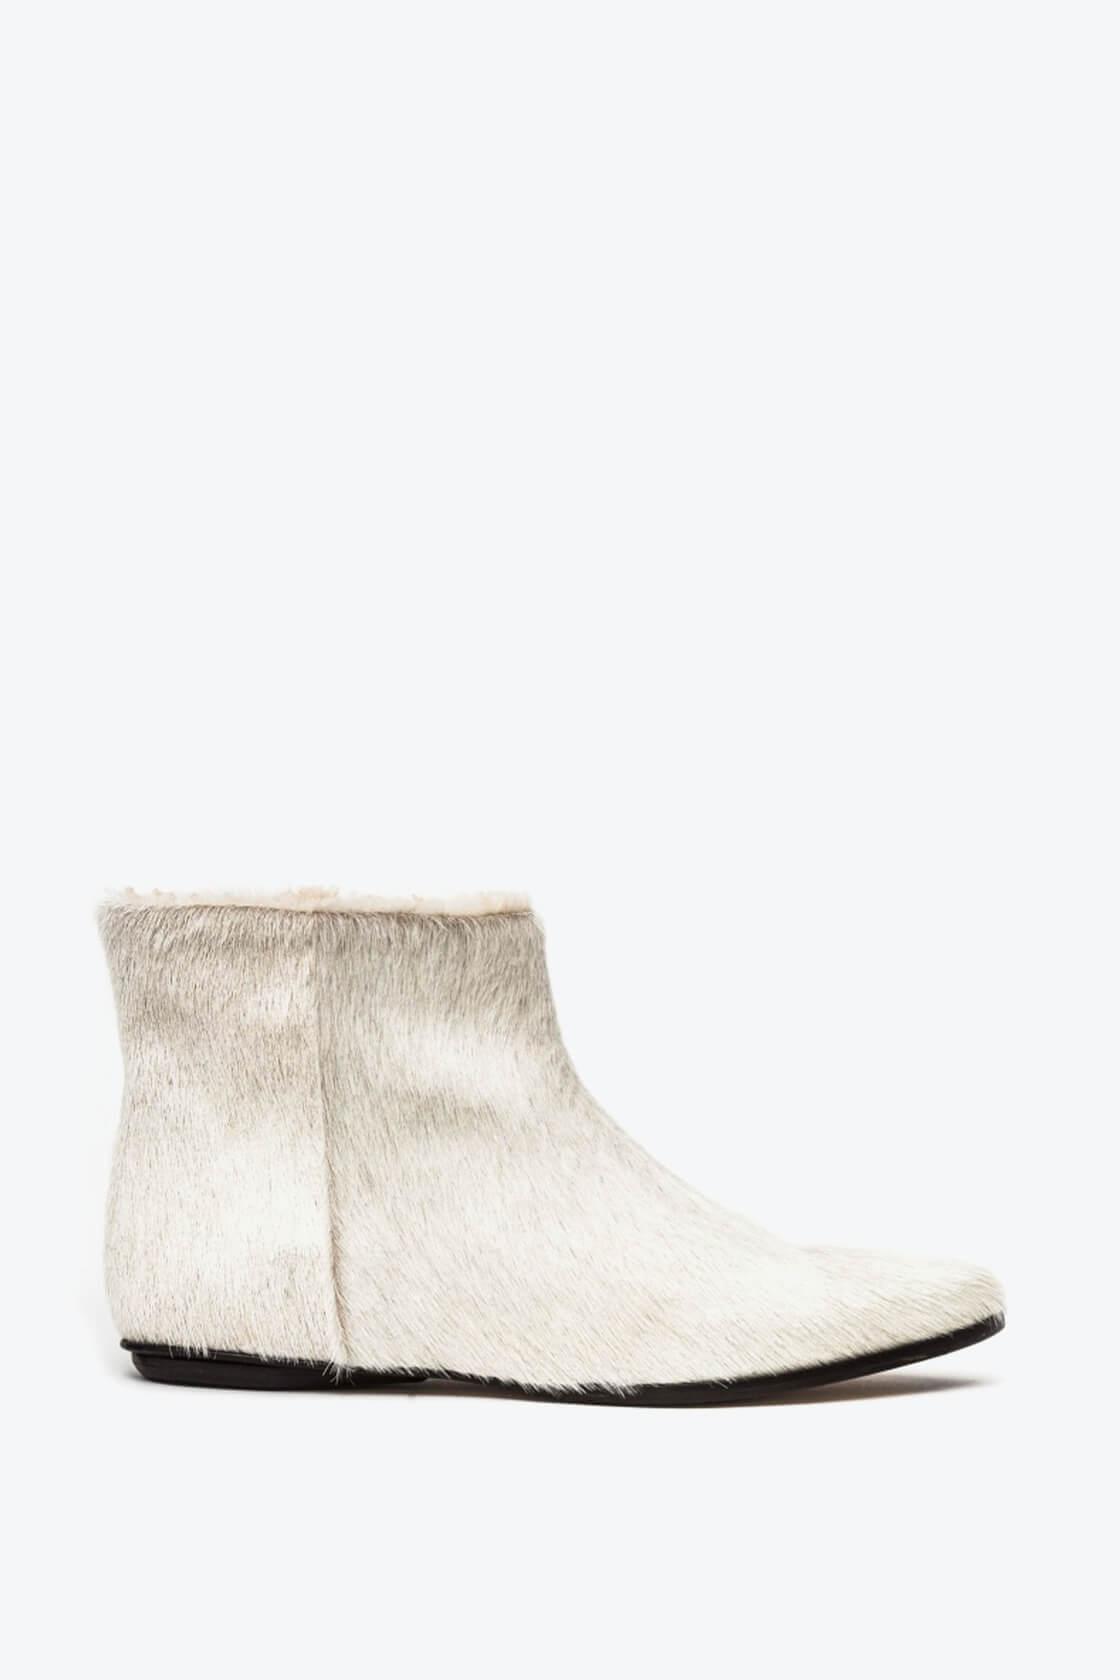 EJK0000072 Zedd ankle boots cream 1